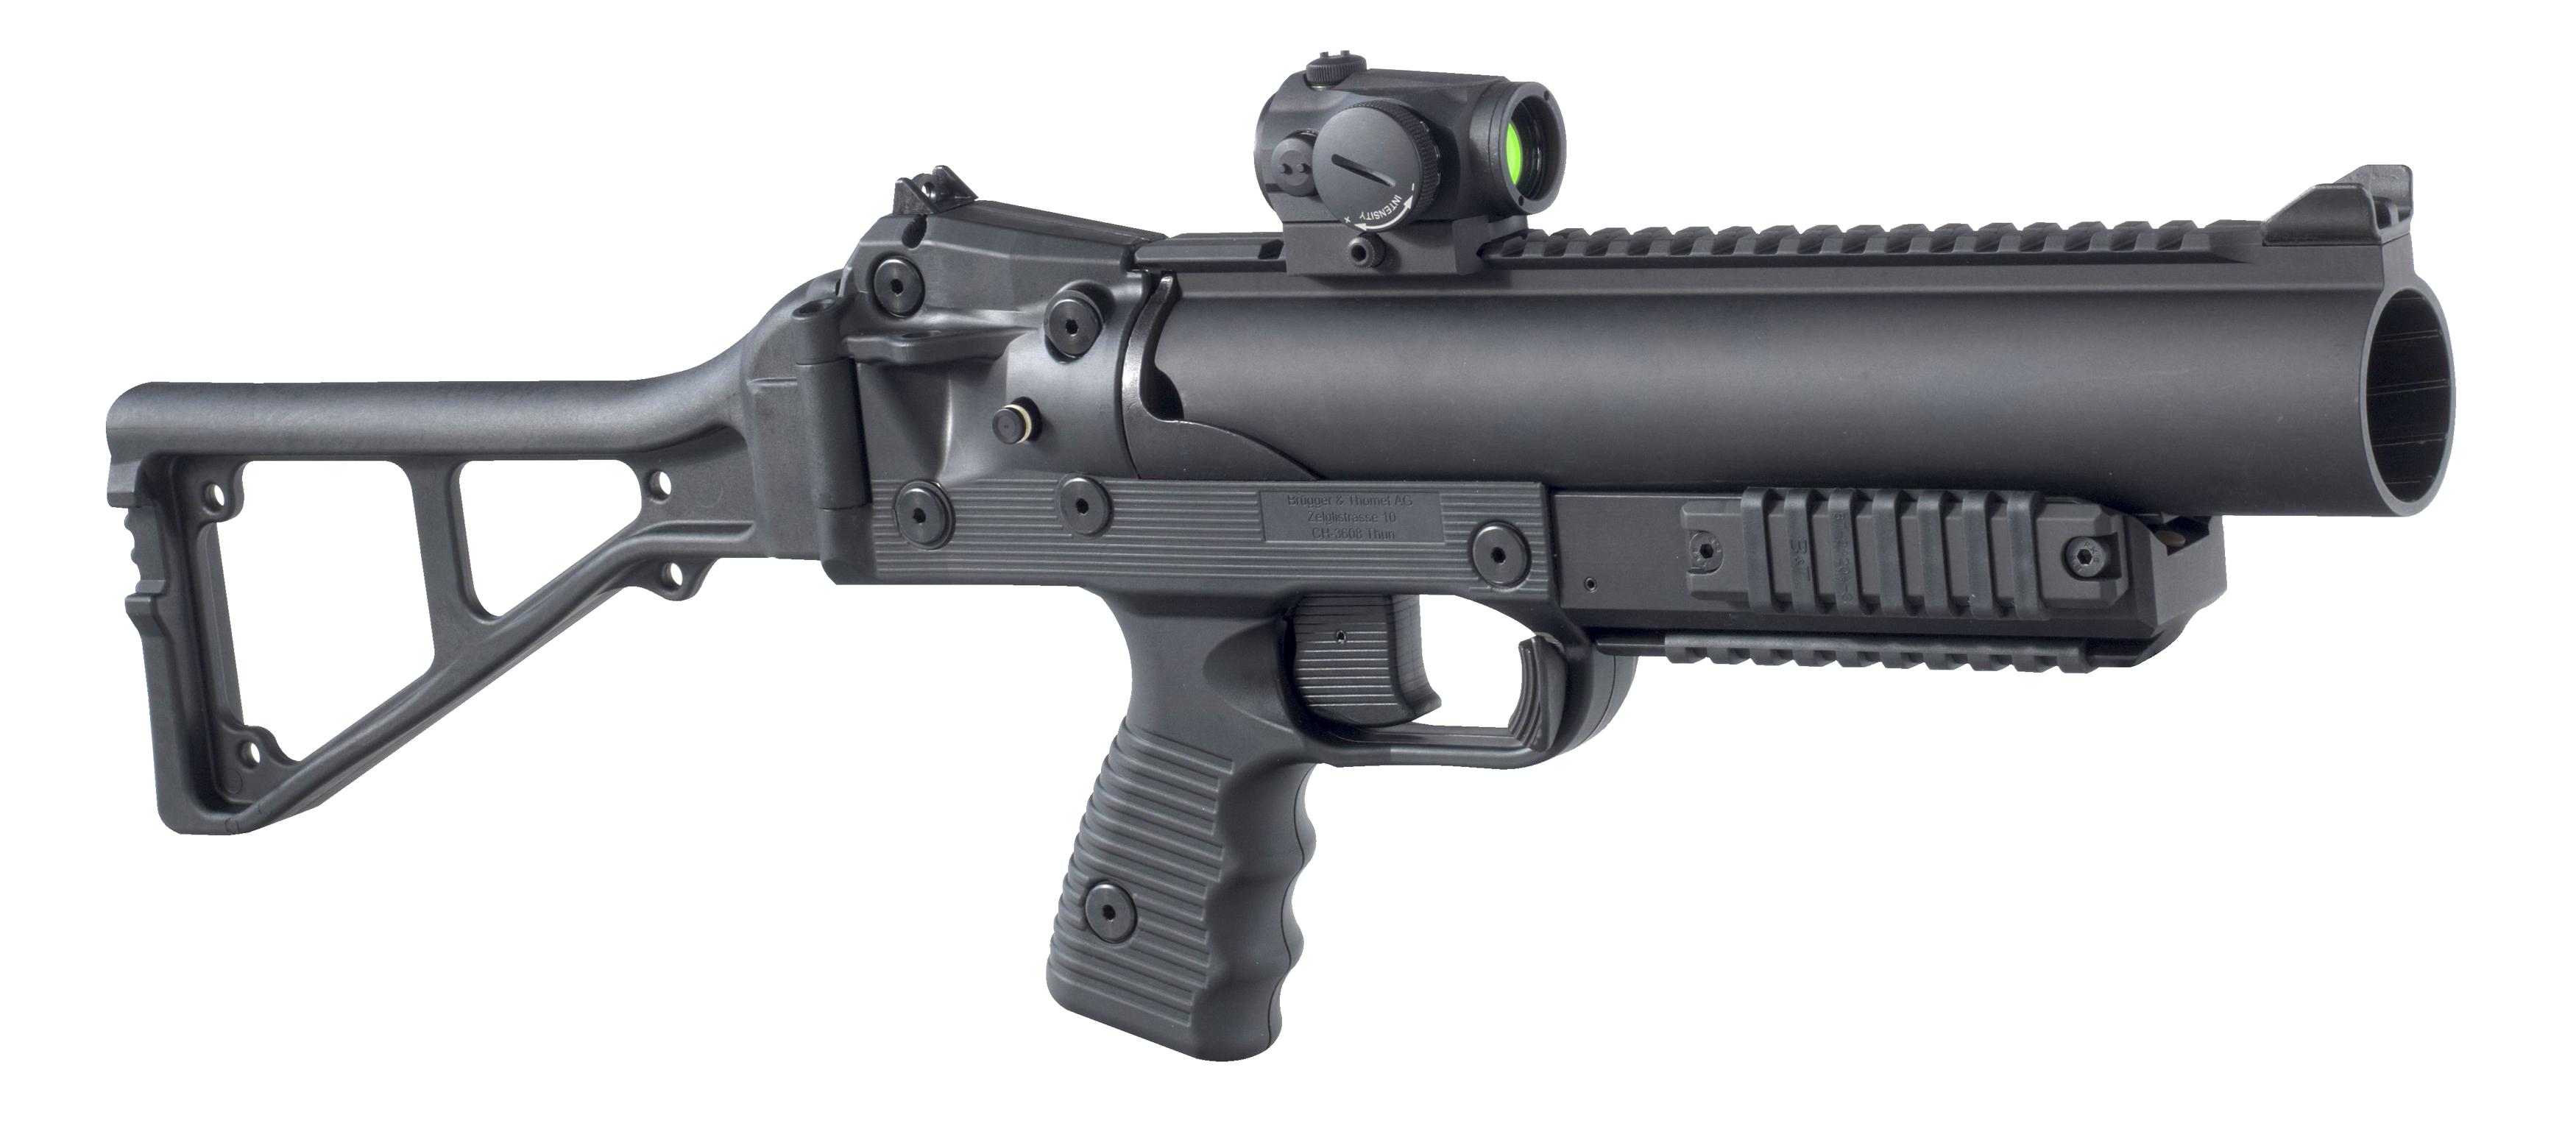 Grenade Launcher HD PNG-PlusPNG.com-3500 - Grenade Launcher HD PNG